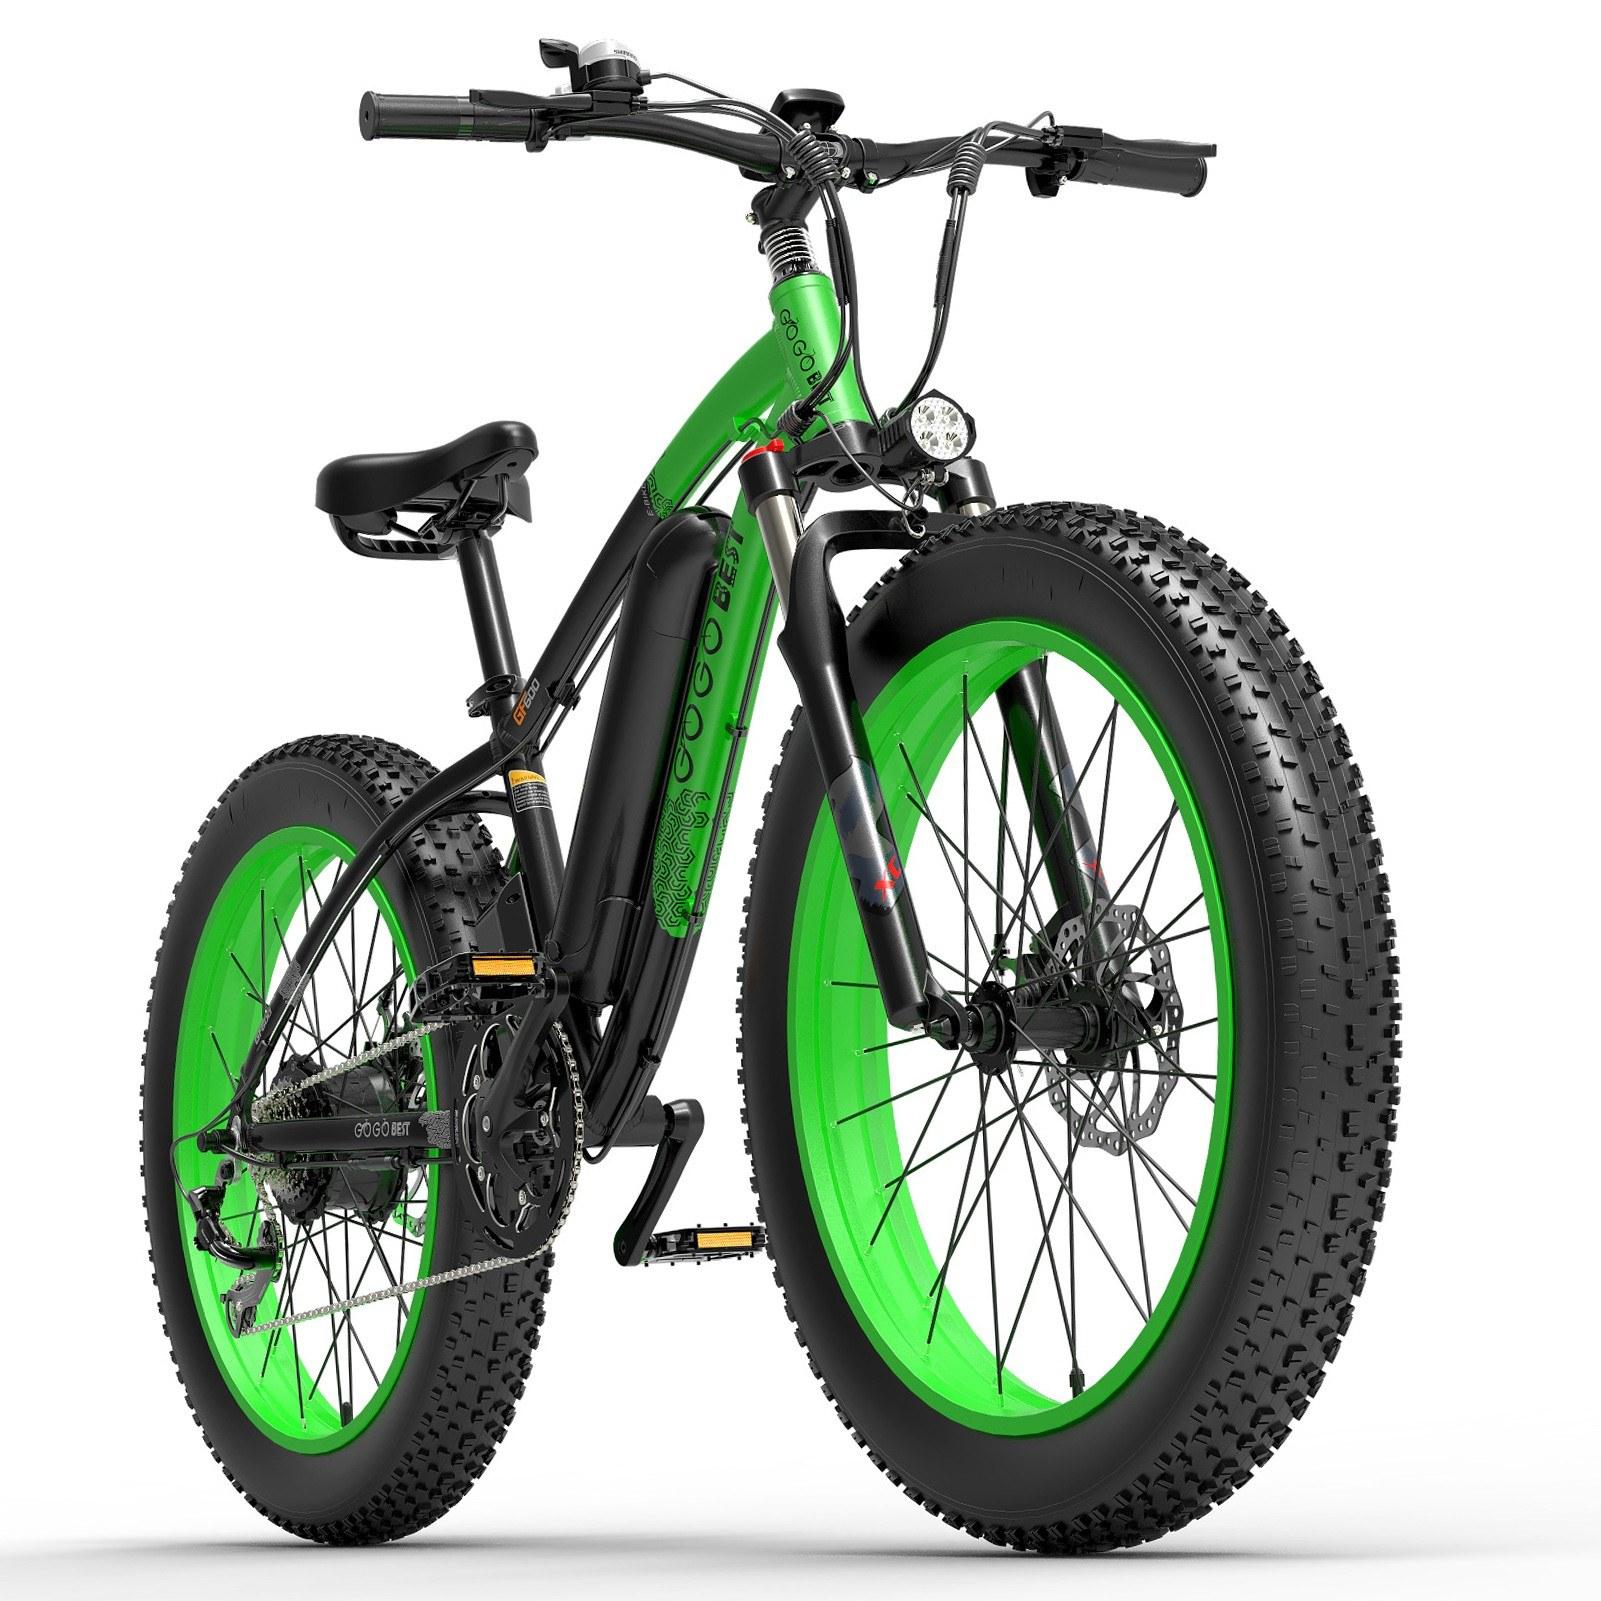 cafago.com - 40% OFF GOGOBEST GF600 1000W Power Assist Electric Bicycle,free shipping+$1443.56